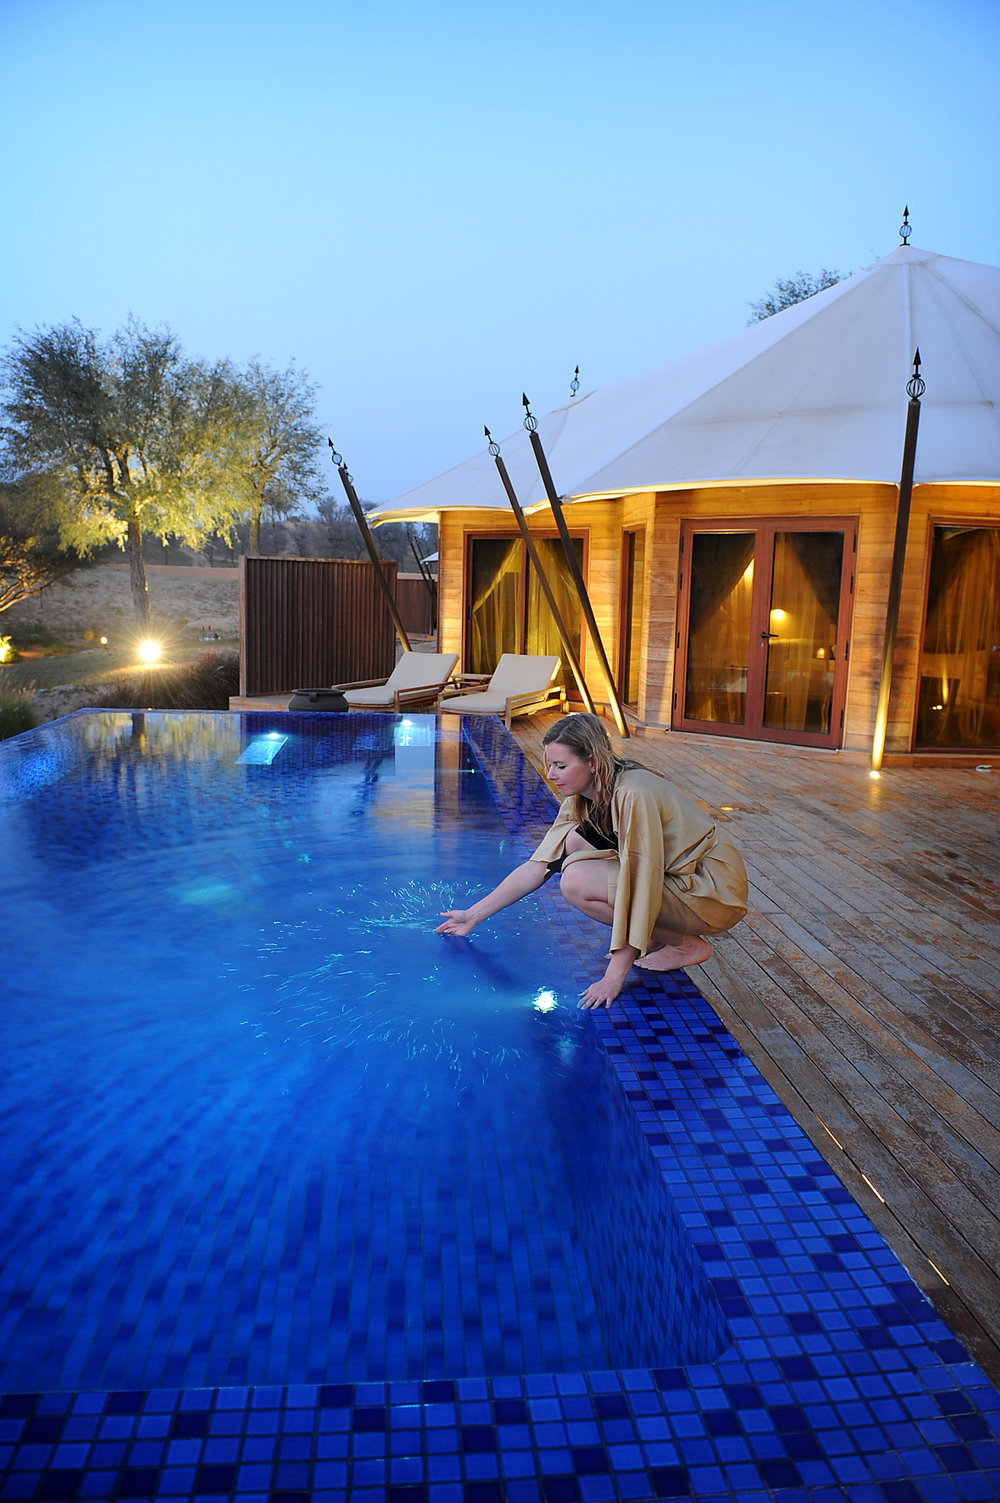 Hotelli, Dubai, Arabiemiraatit, aavikko, Banyan, matka, matkablogi